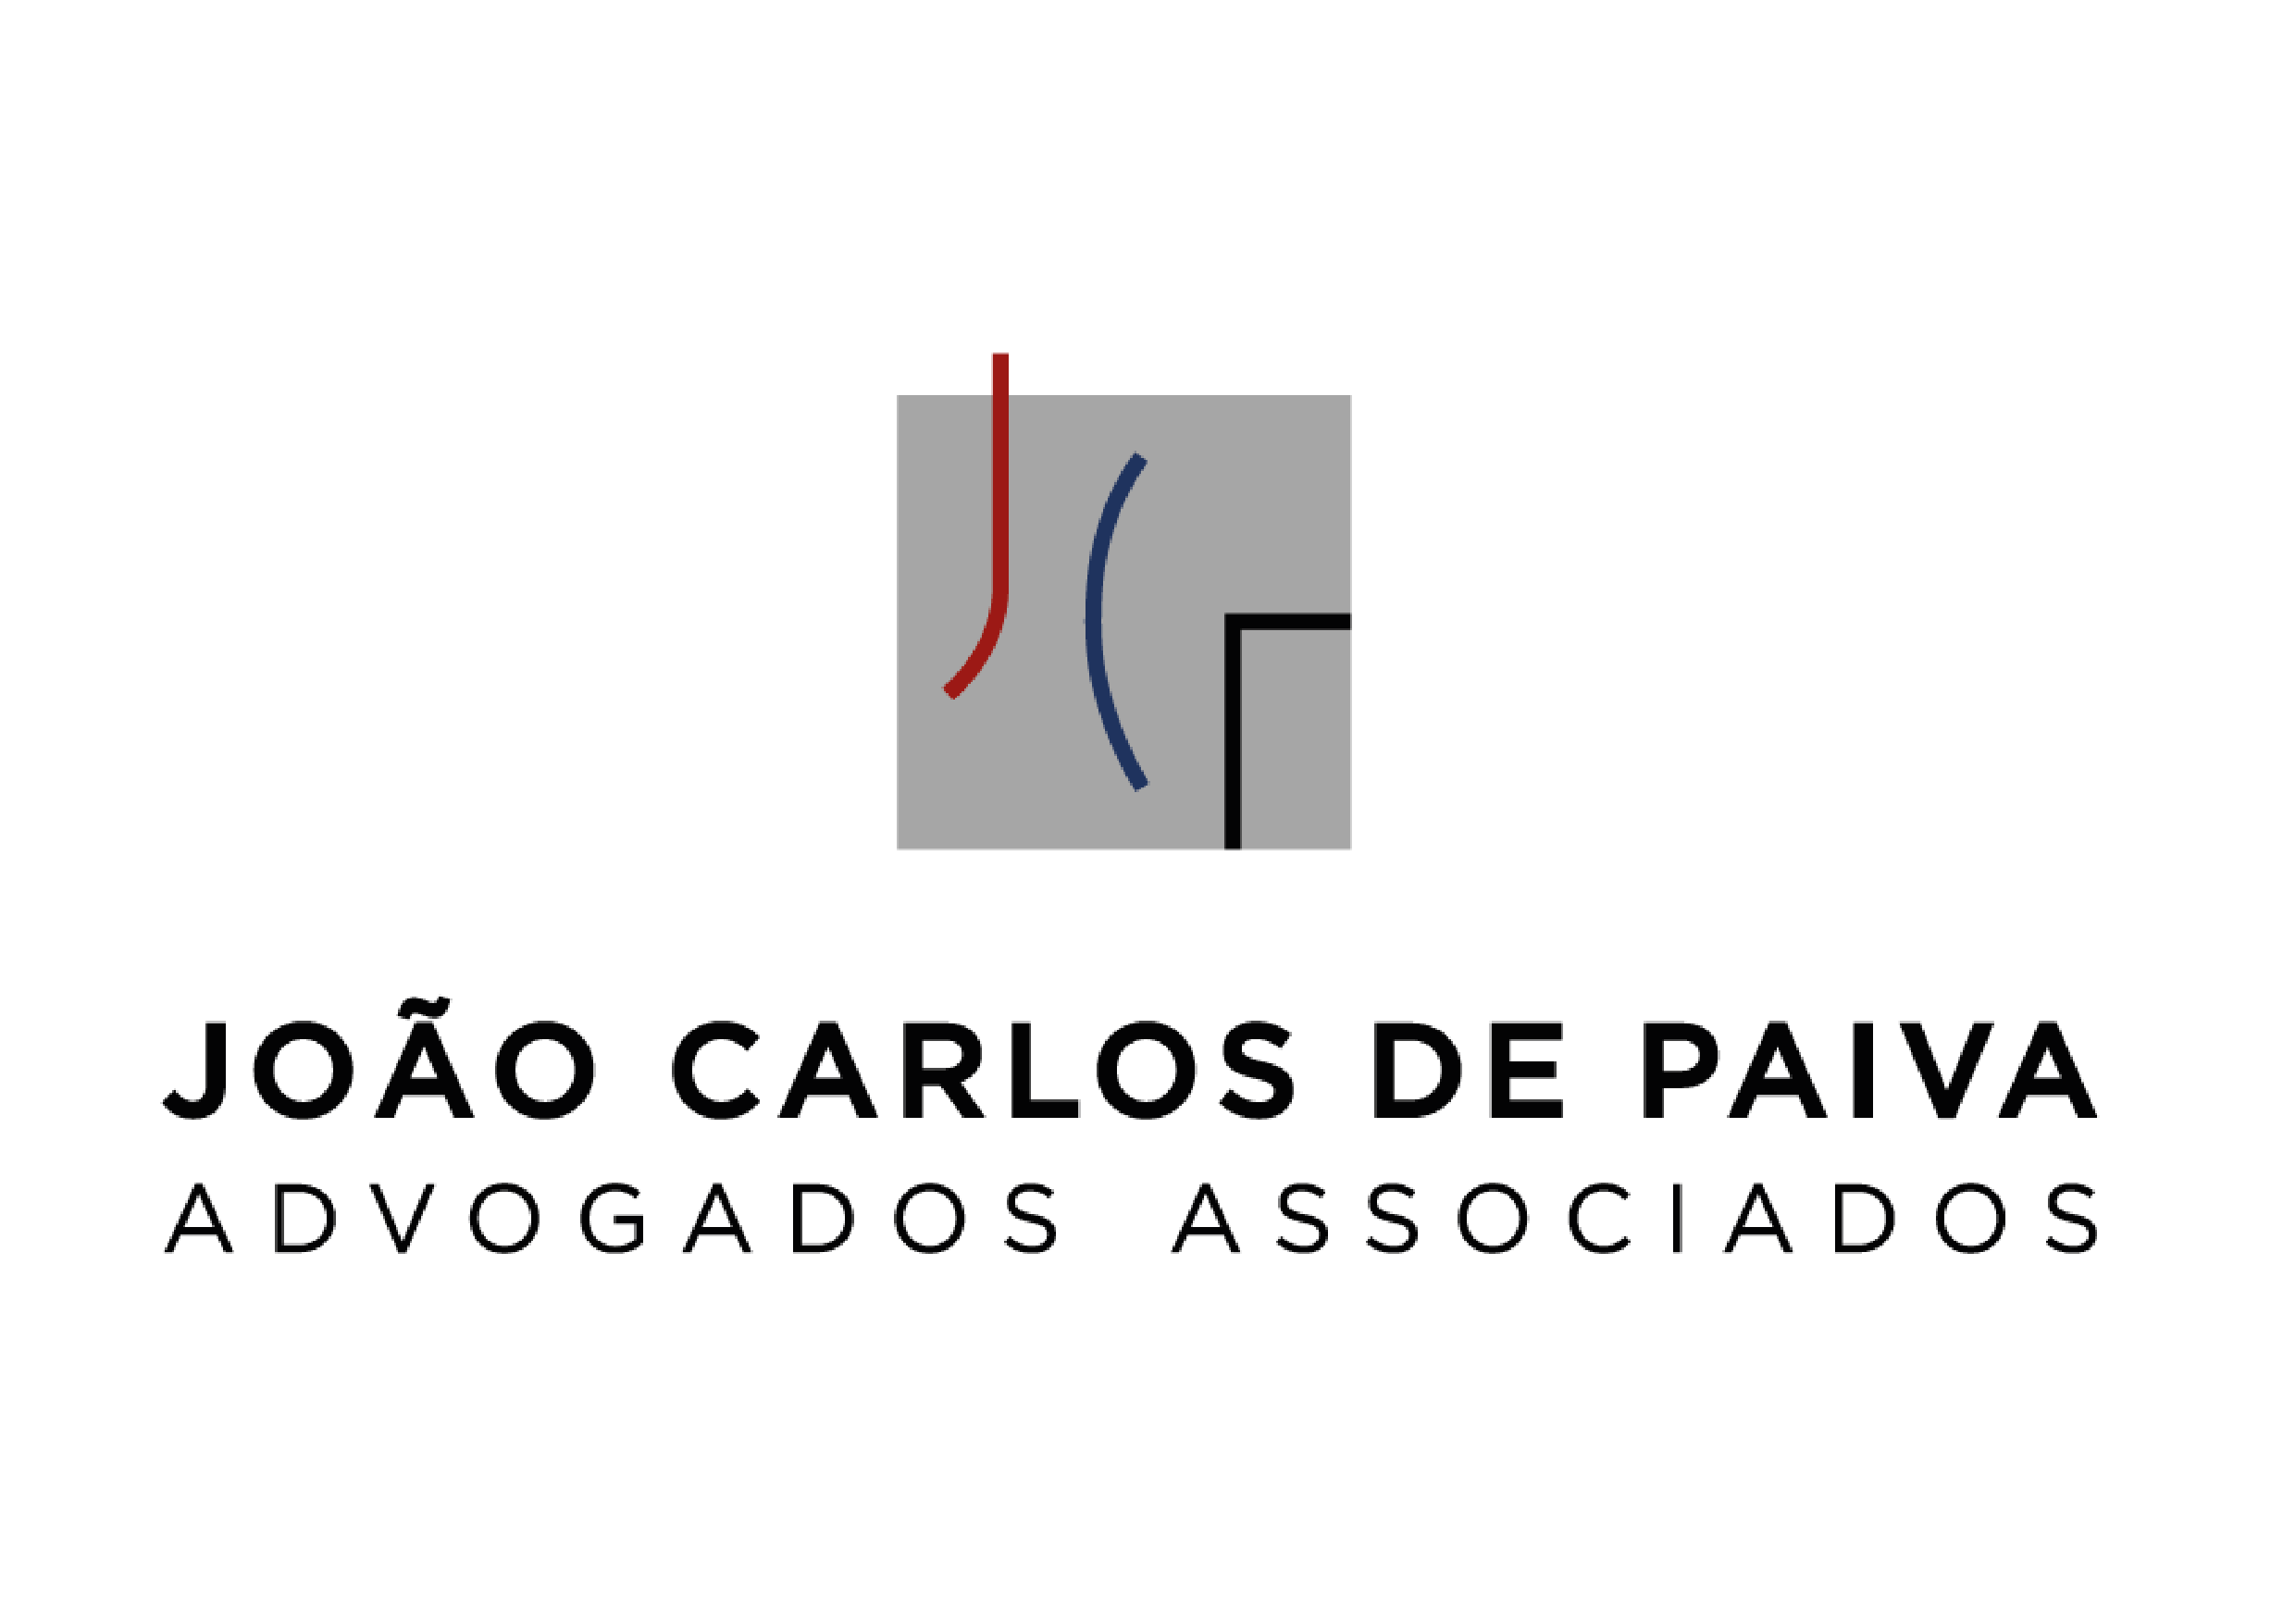 JC-PAIVA-vertical-colorido_Prancheta 1